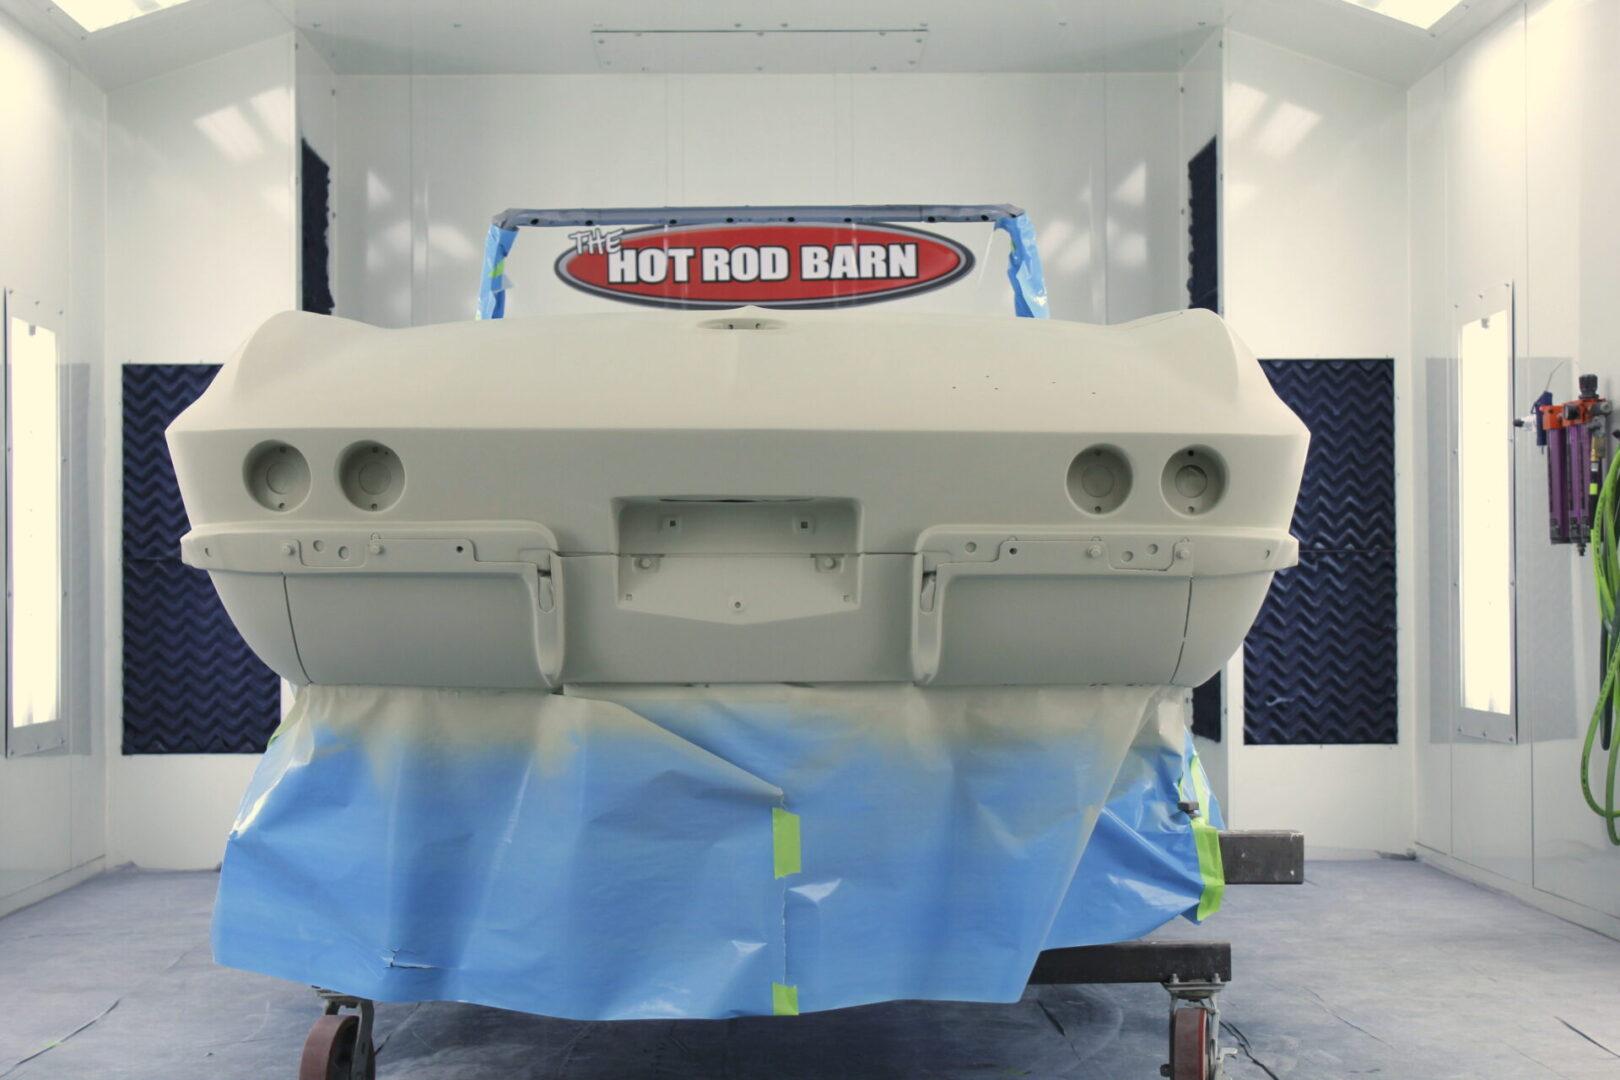 The Hot Rod Barn